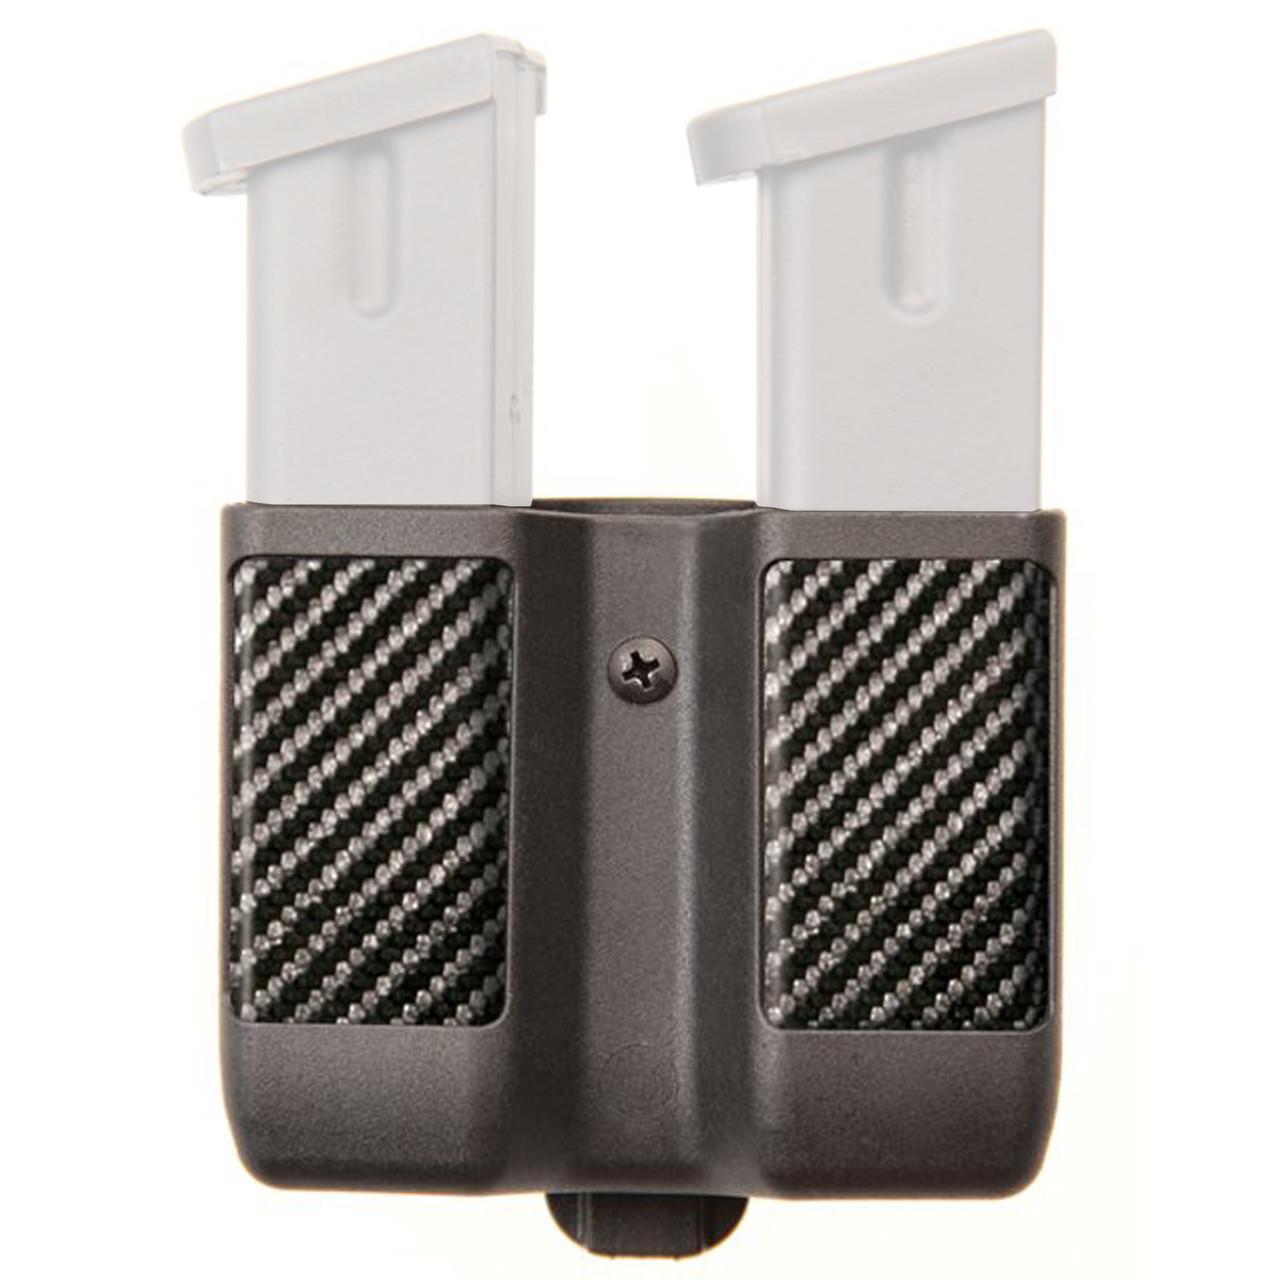 BlackHawk Double Mag Case Double Stack CF 9mm//.40 cal Black Finish 410610CBK